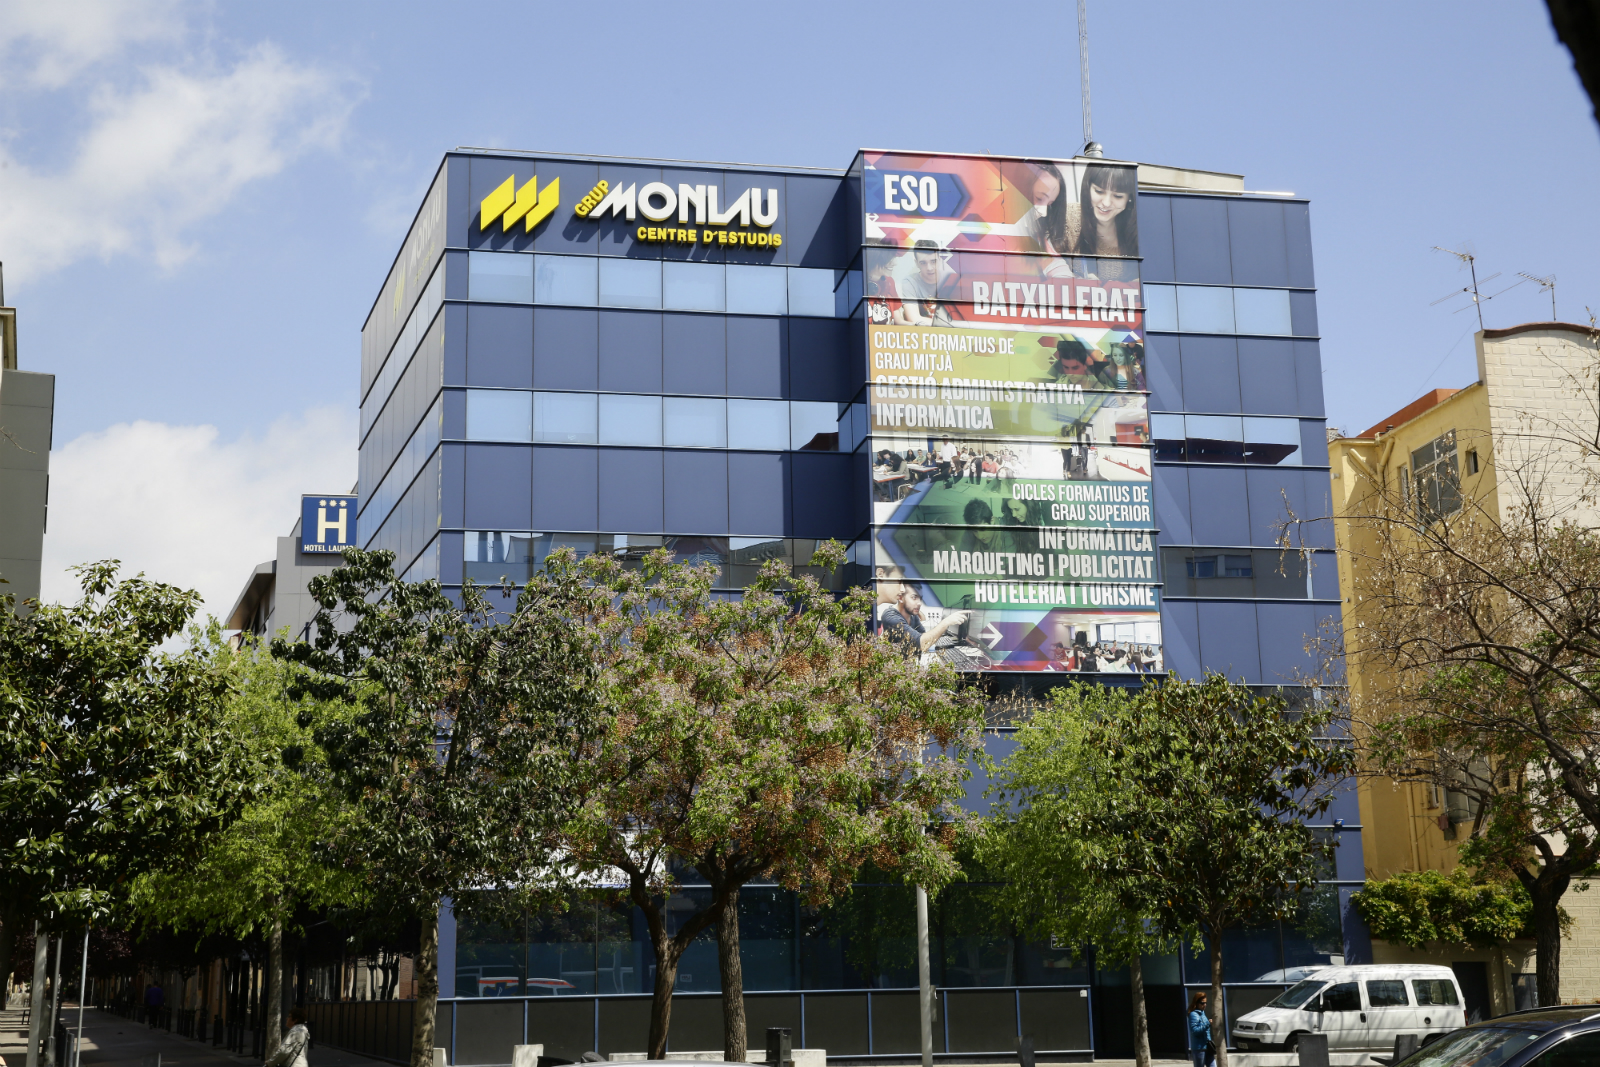 Monlau Centro De Estudios - Barcelona - Monlau, 6 BAJO | Colegios ...